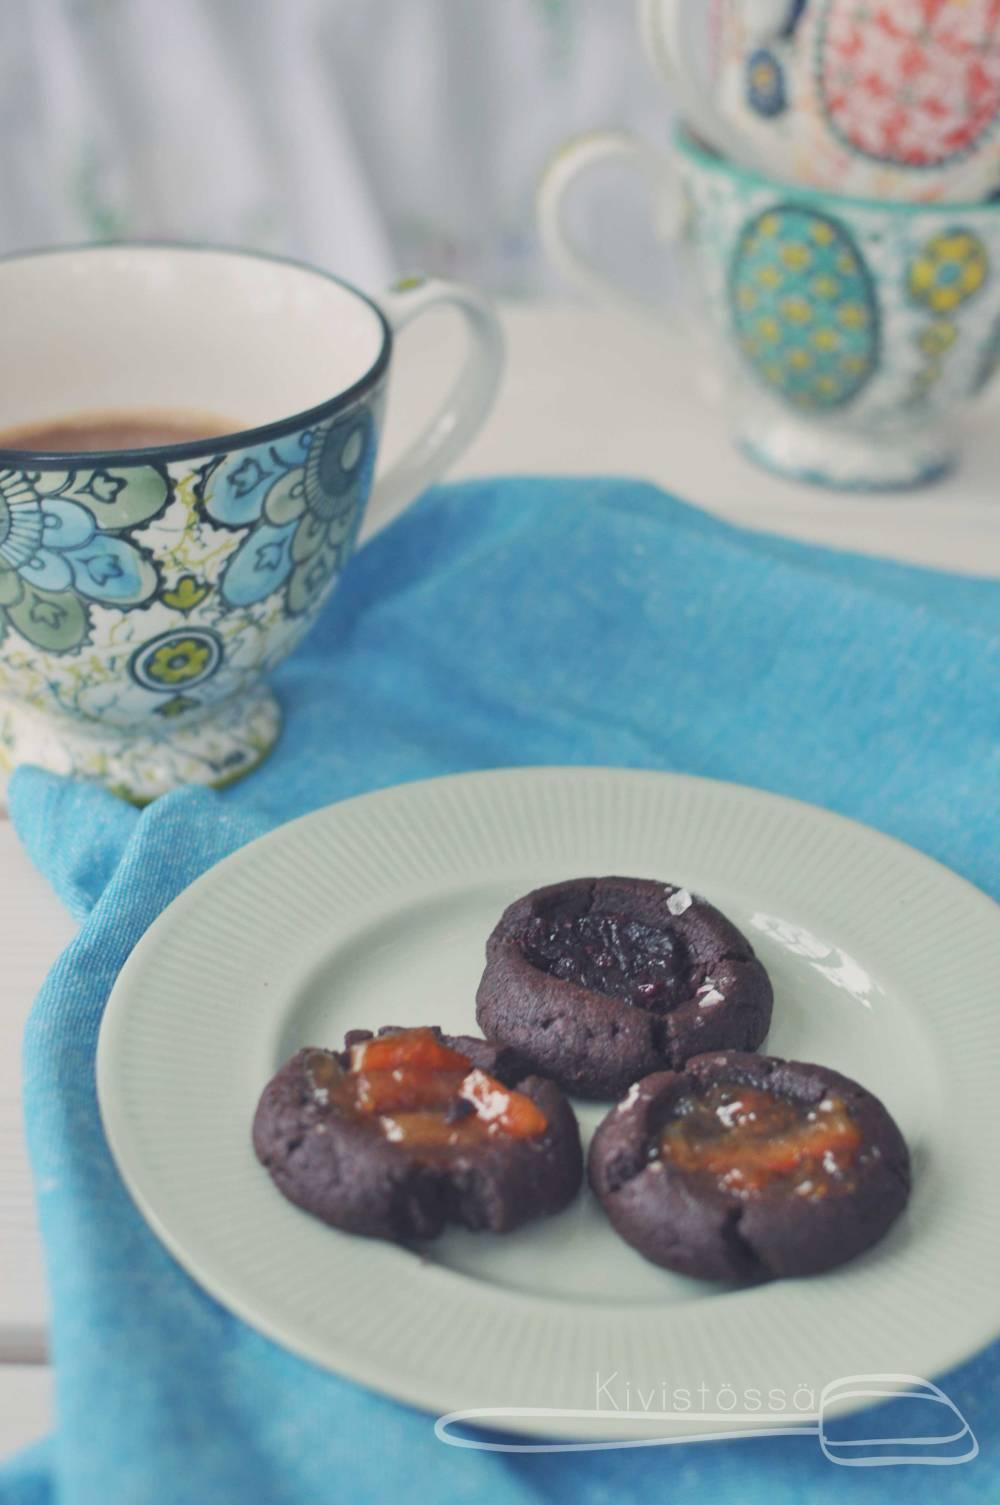 Chocolate thumbprint cookies. Kivistössä Foodblog www.kivistossa.com